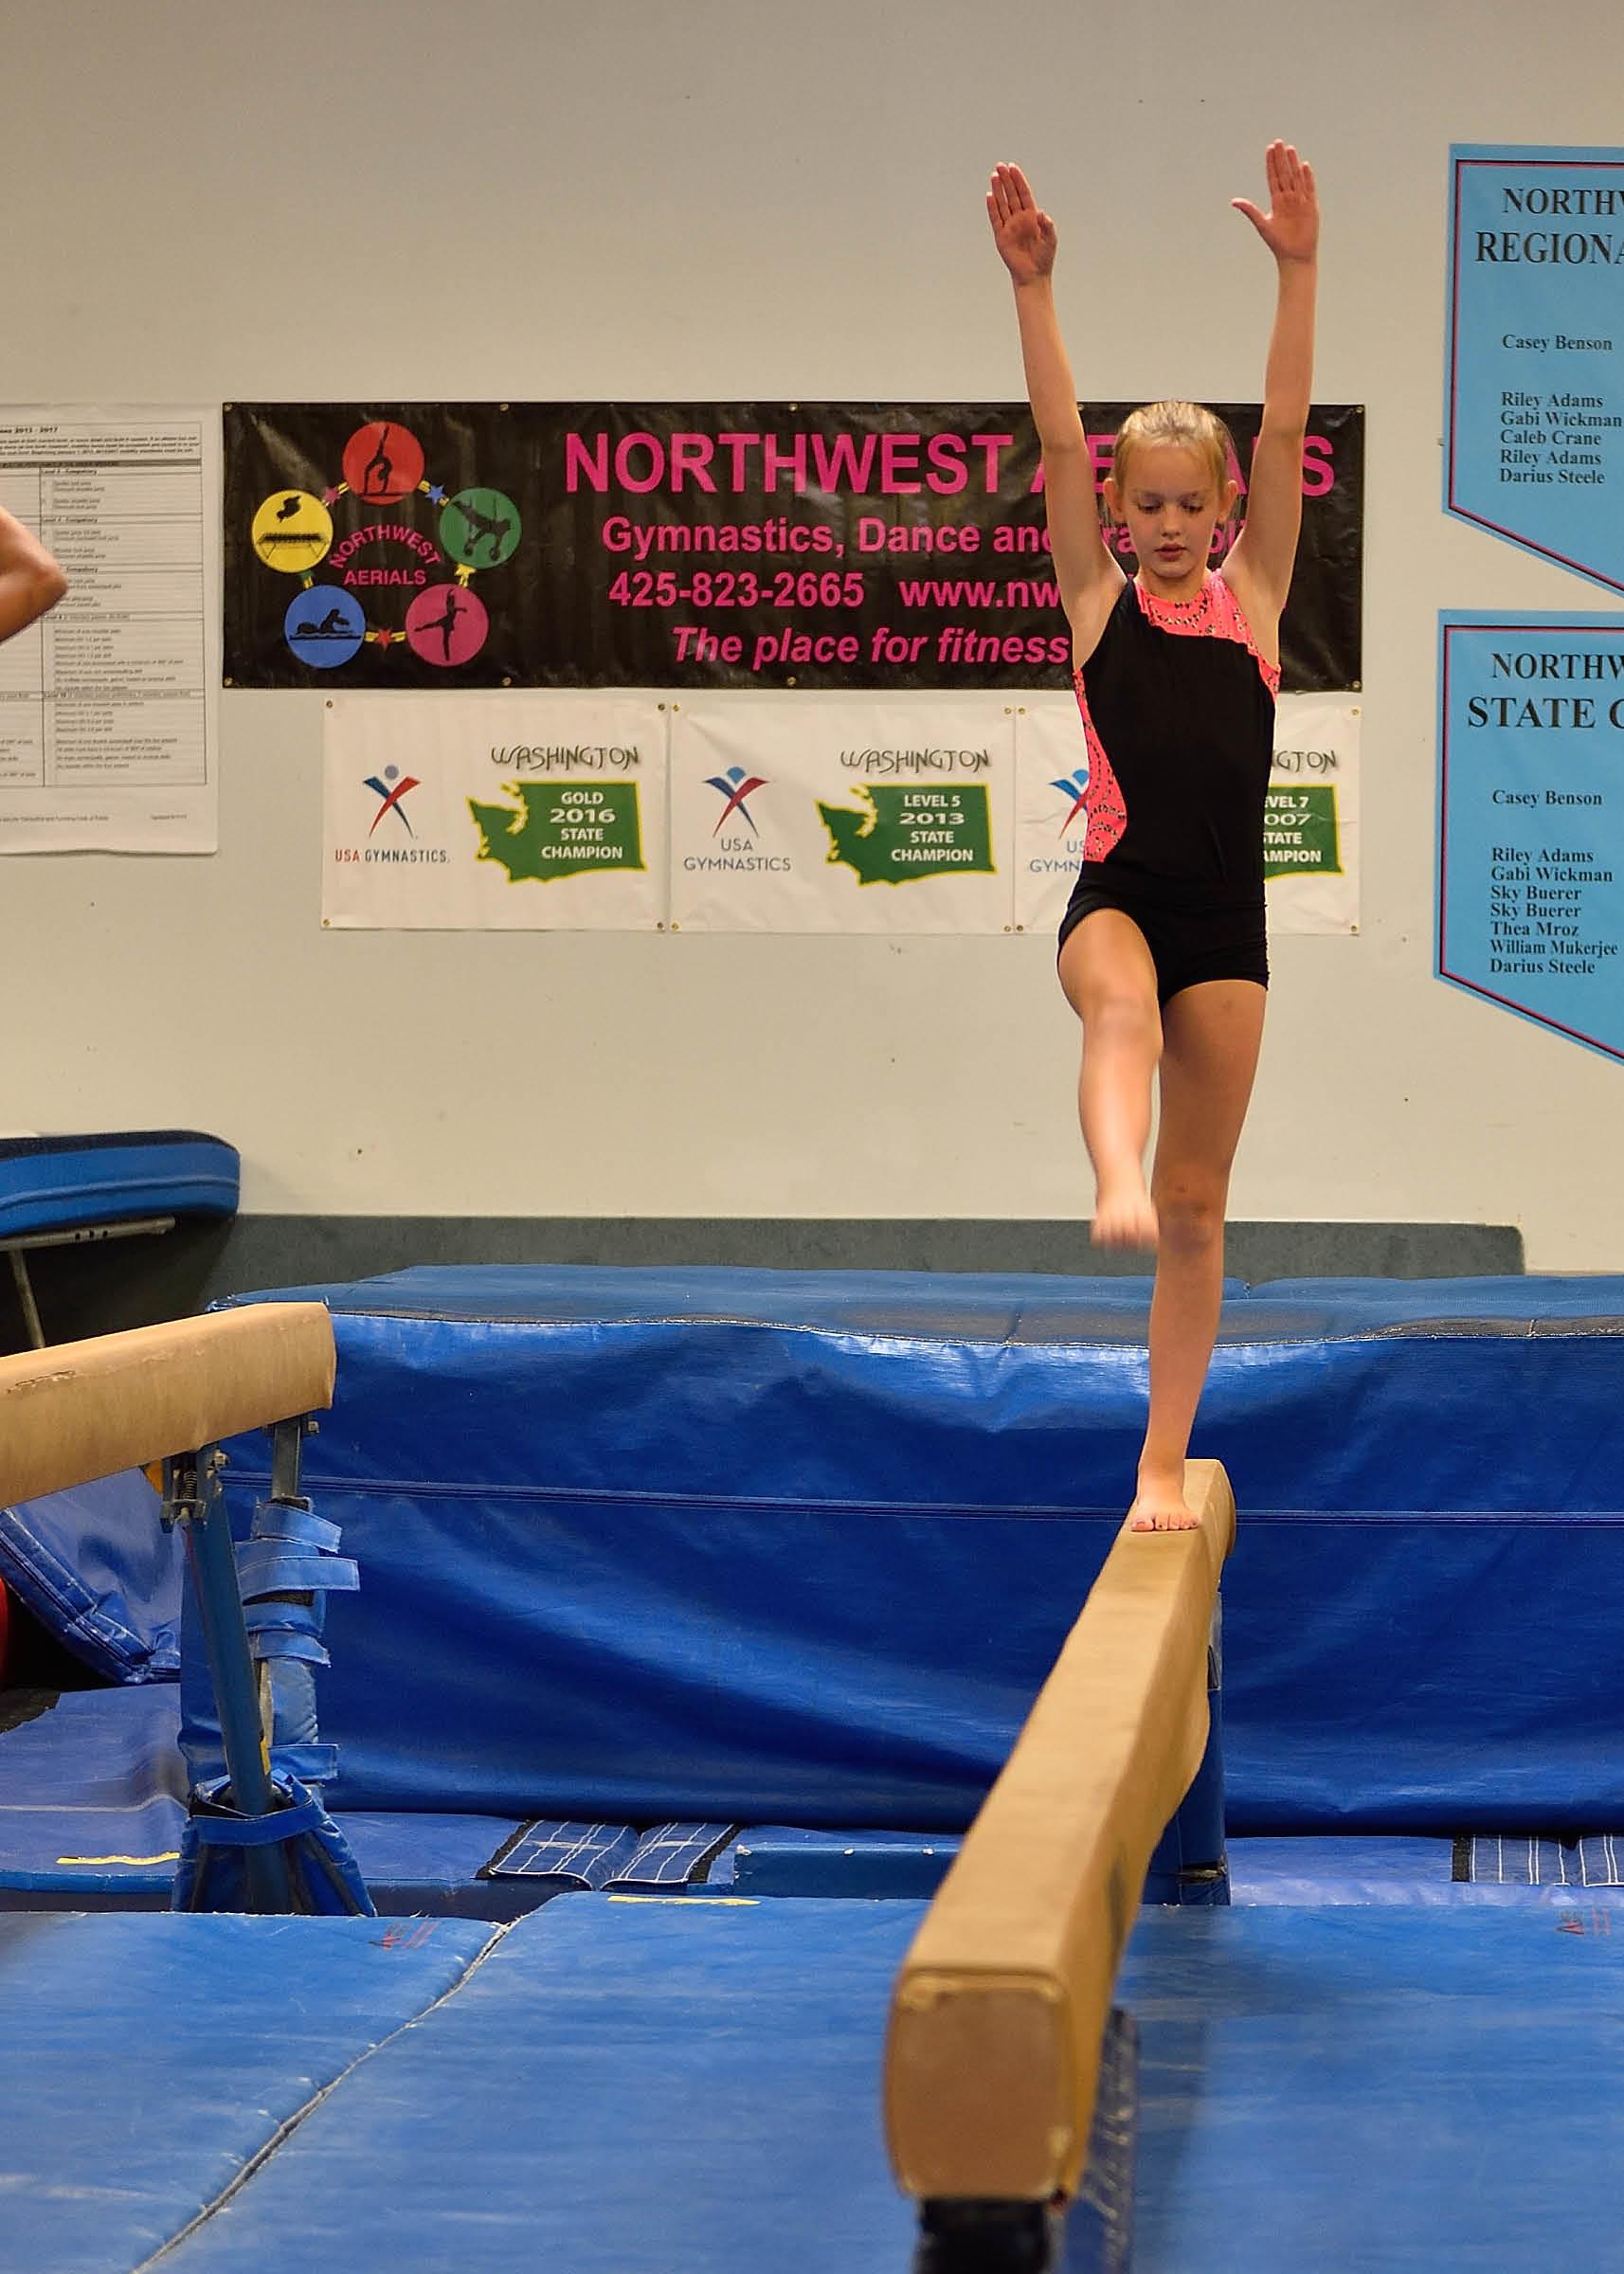 Northwest Aerials - Kirkland, WA - girl on balance beam - gymnastics training - dance - trampoline